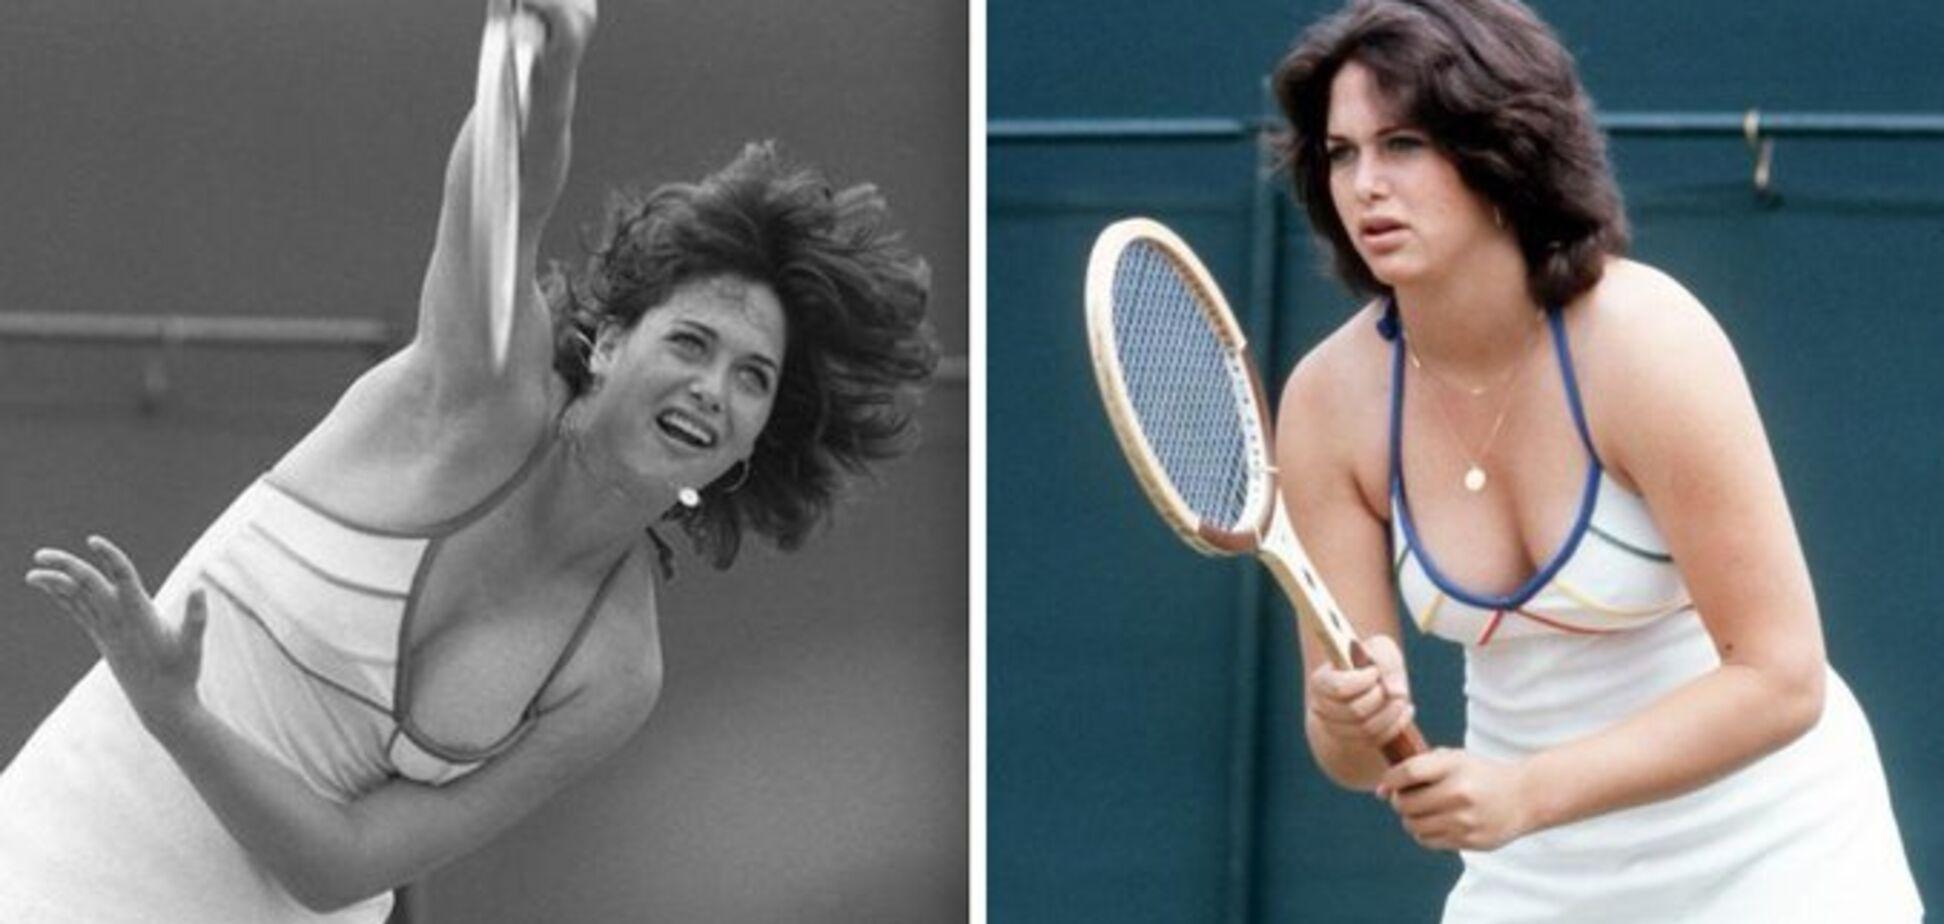 В сети вспомнили теннисистку, снявшую лифчик на Wimbledon - фотофакт